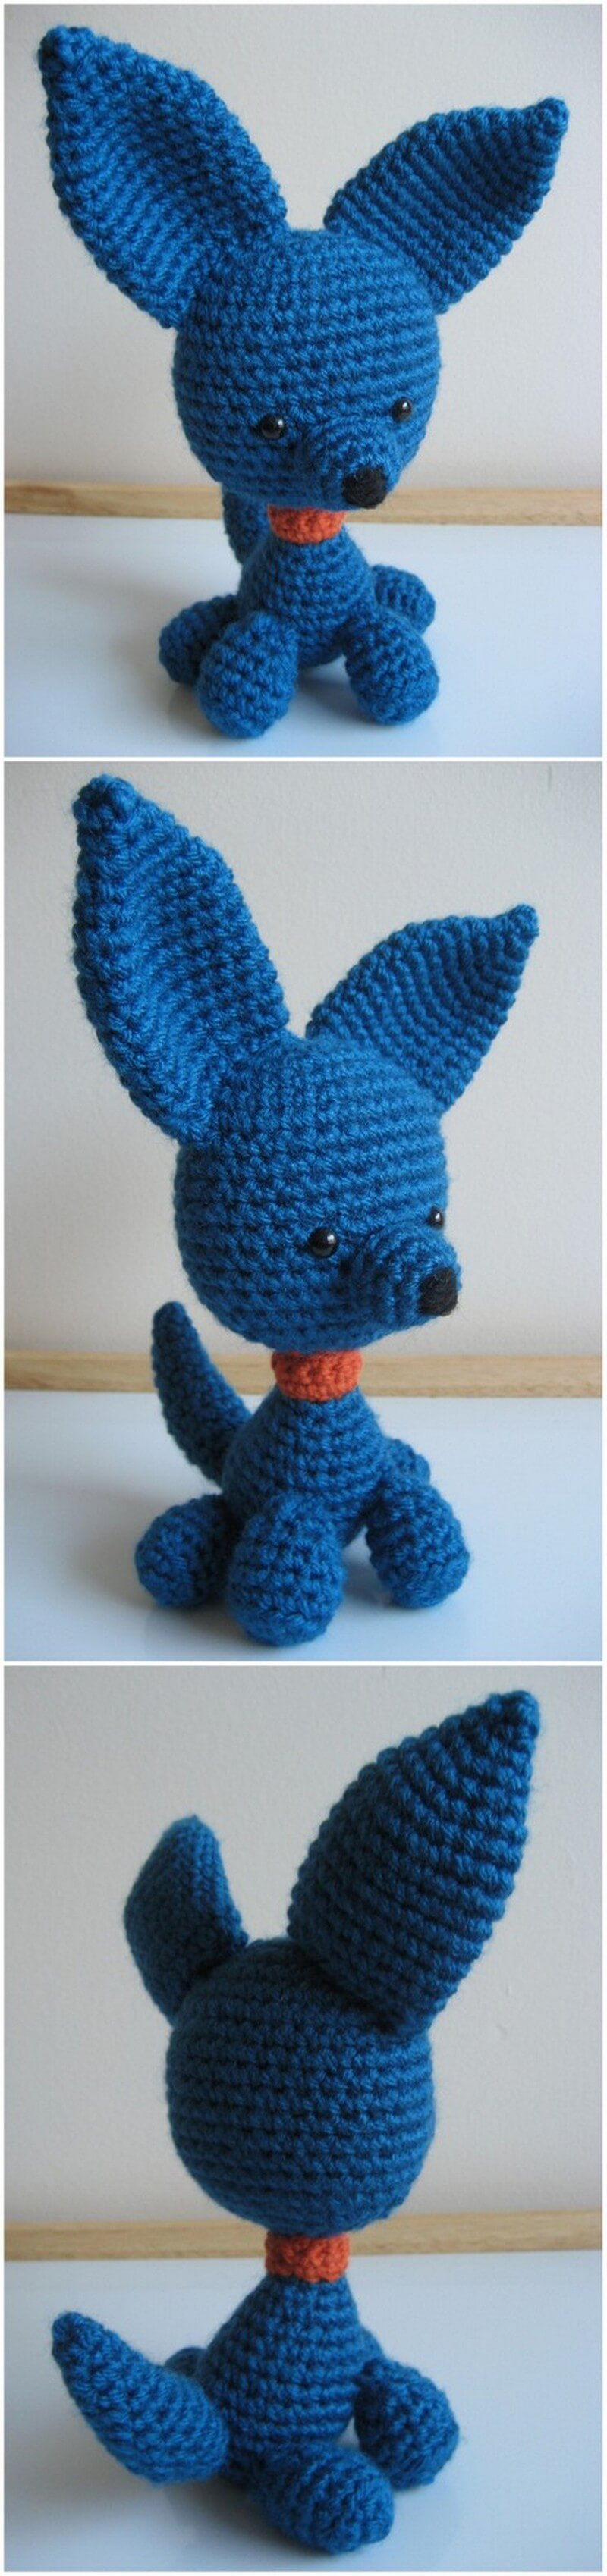 Free Crochet Amigurumi Pattern (34)